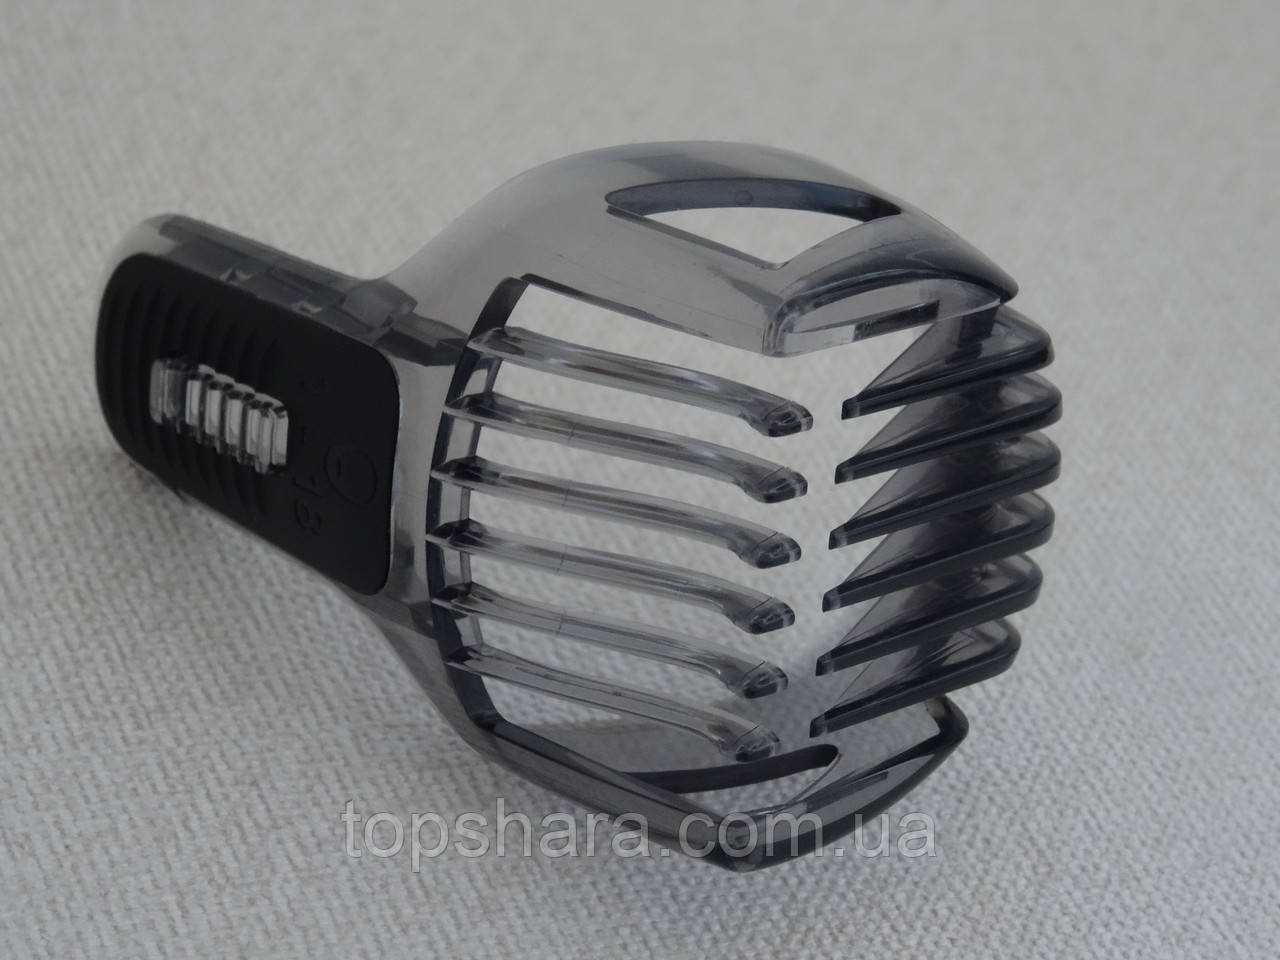 Насадка для триммера Philips QG3371 QG3340 от 1-18 мм.